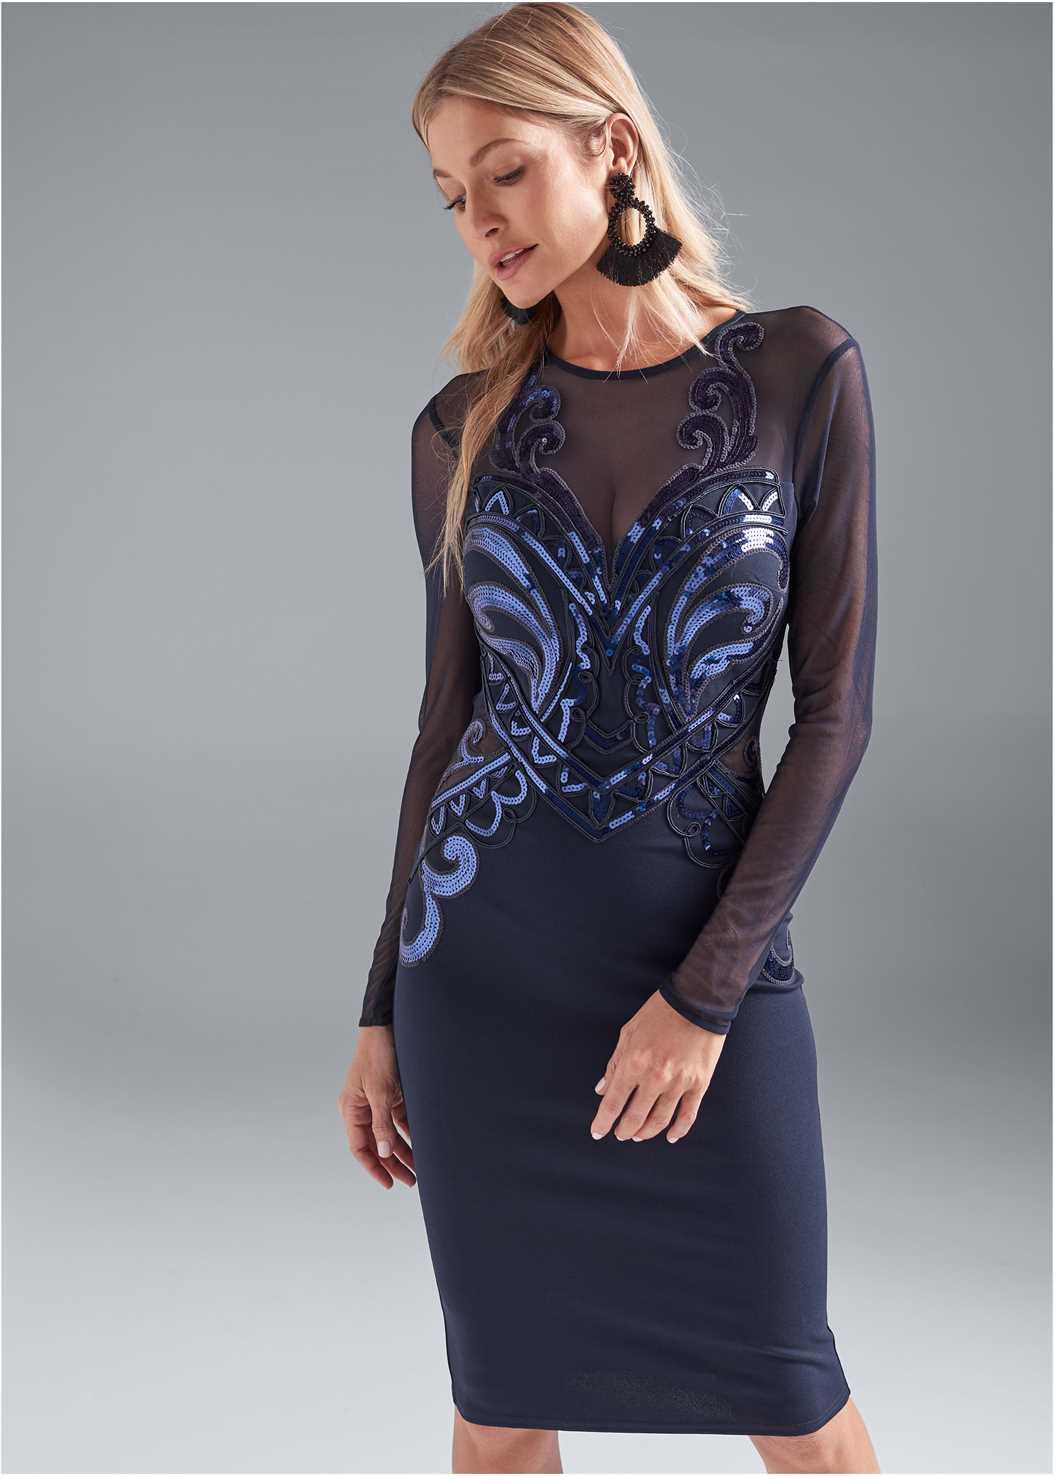 Sequin Bodycon Dress,Beaded Tassel Earrings